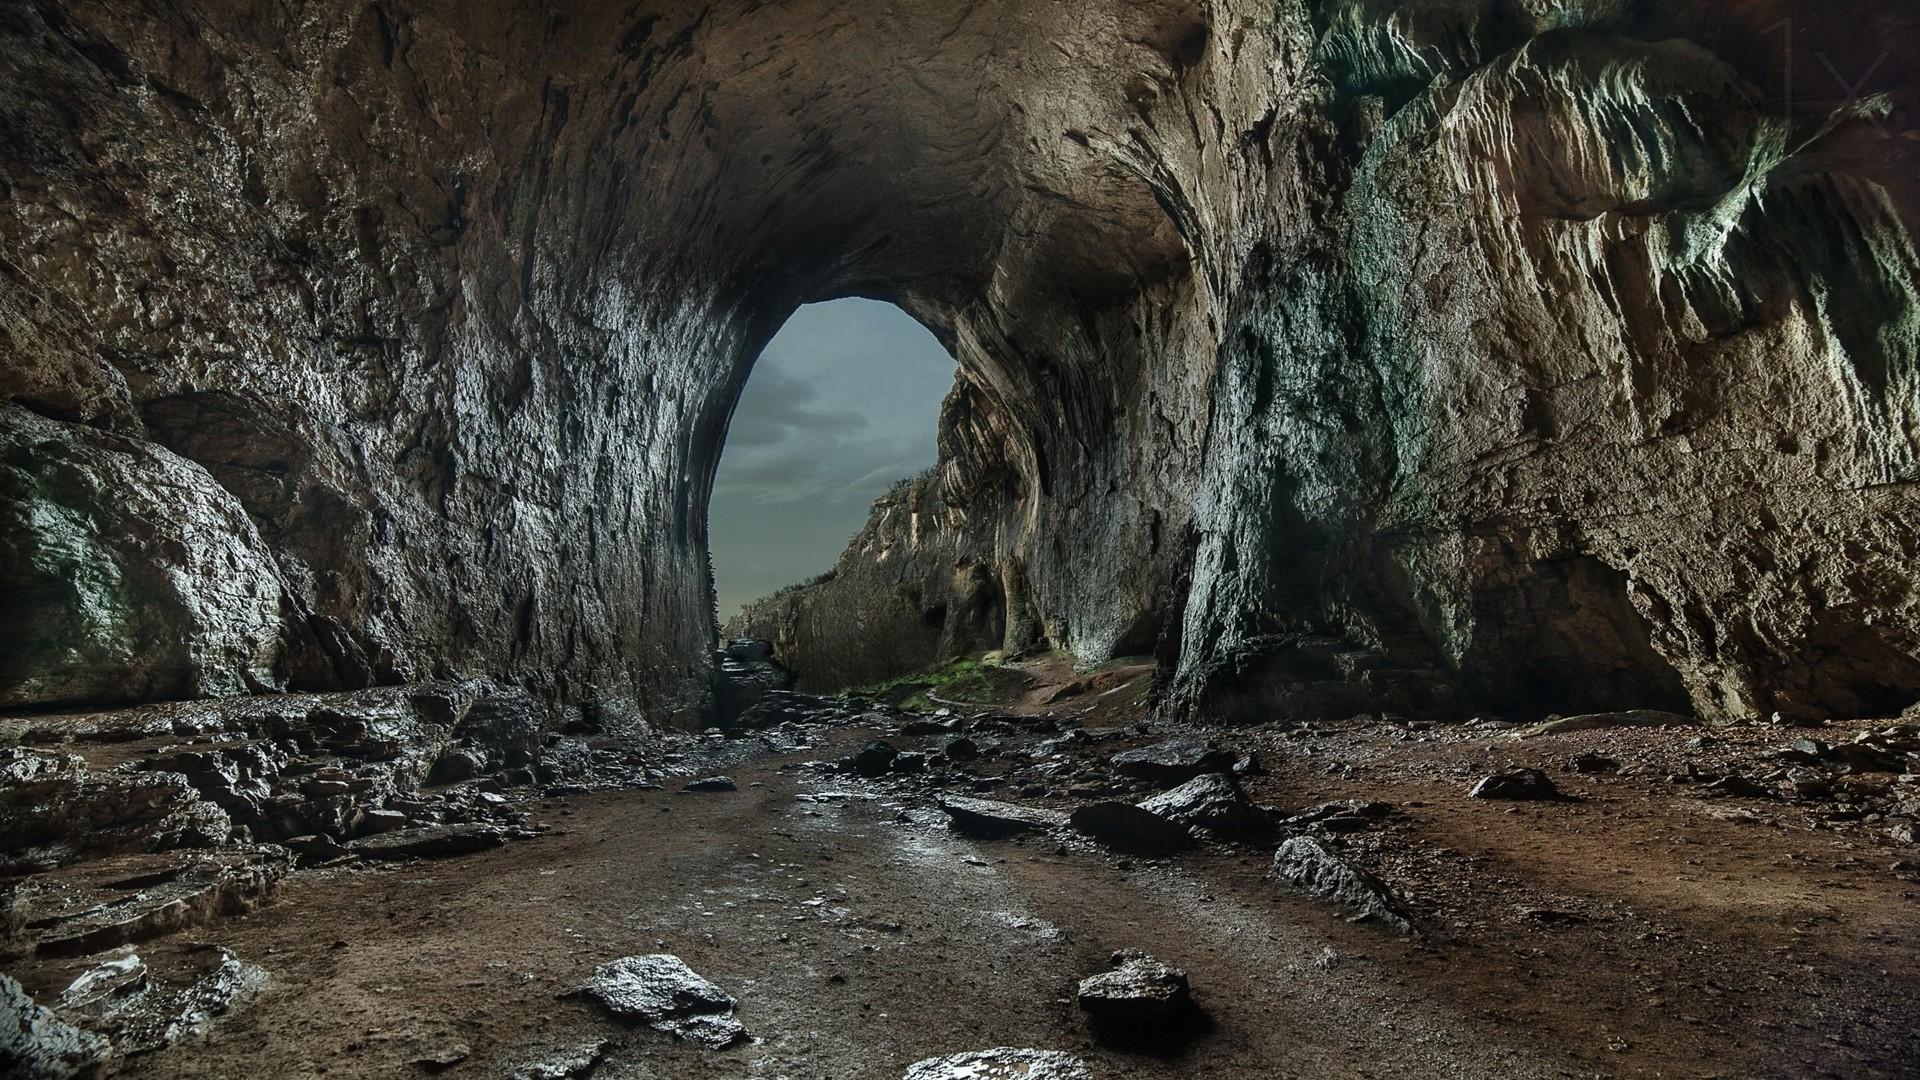 Cave wallpaper 1920x1080 73718 WallpaperUP 1920x1080